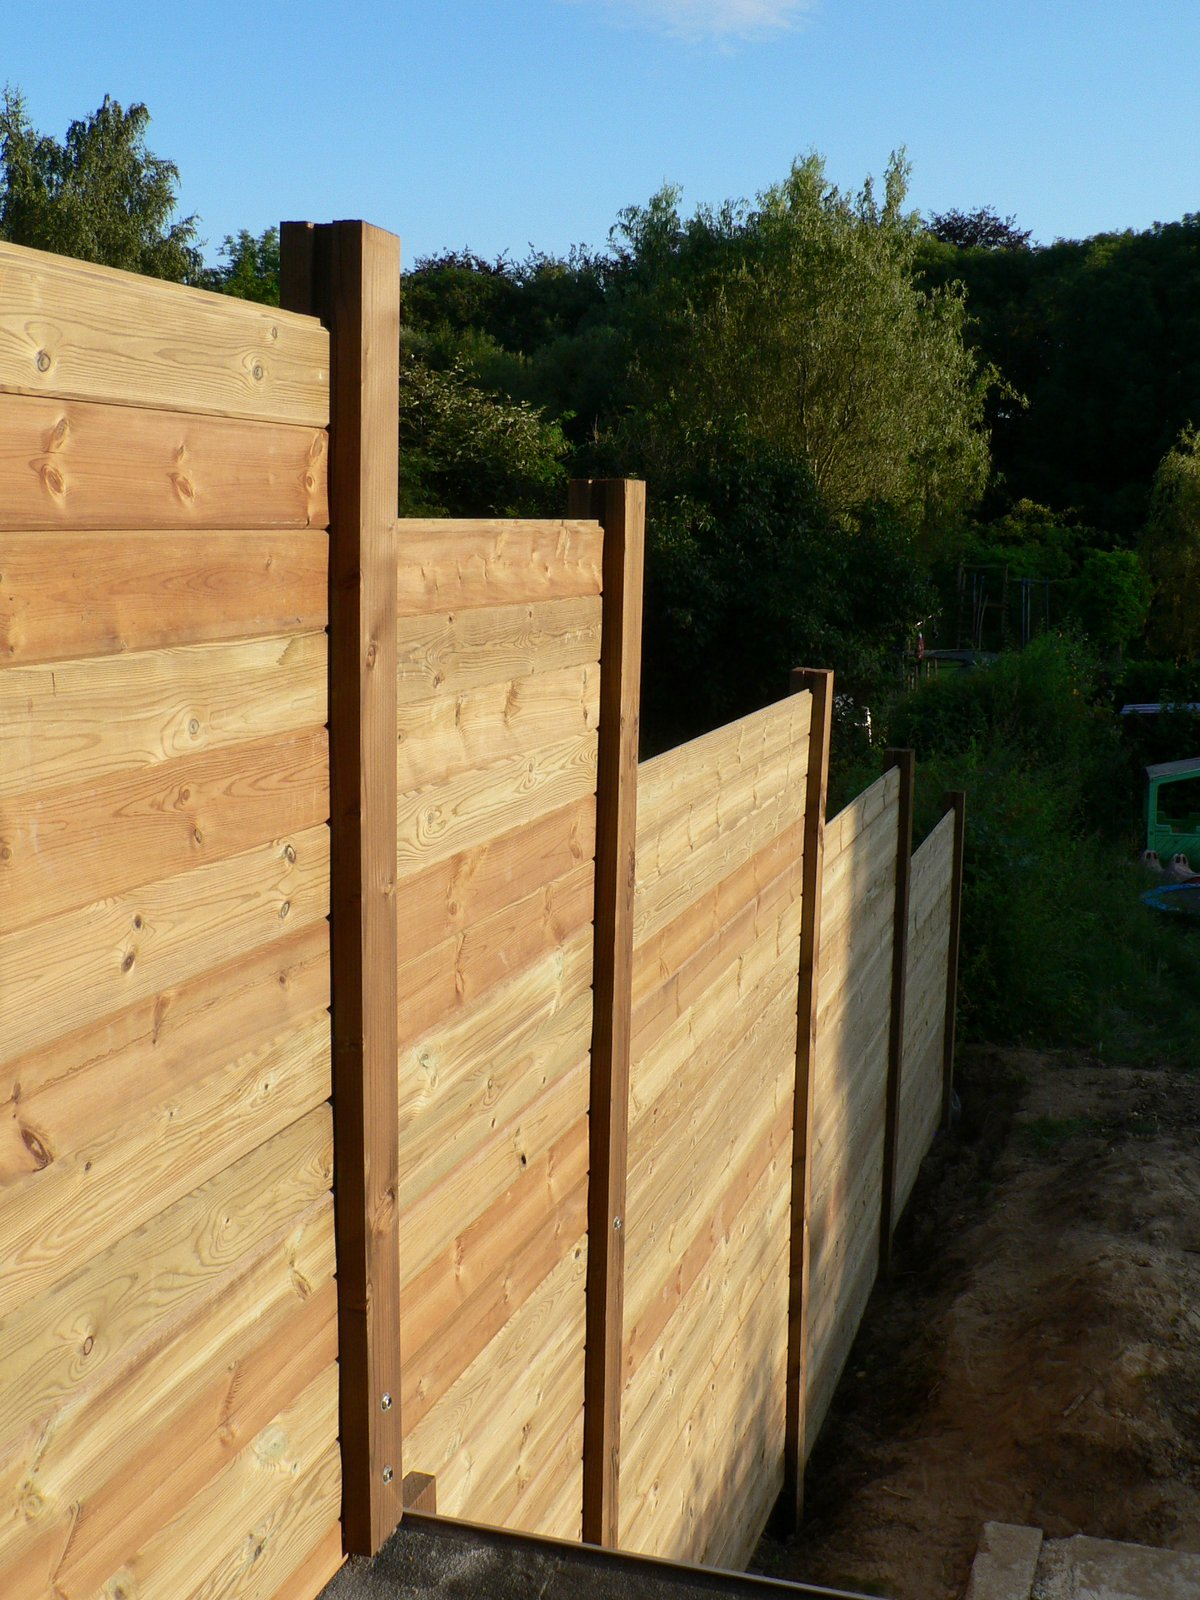 Ons huisje: houten tuinafscheiding